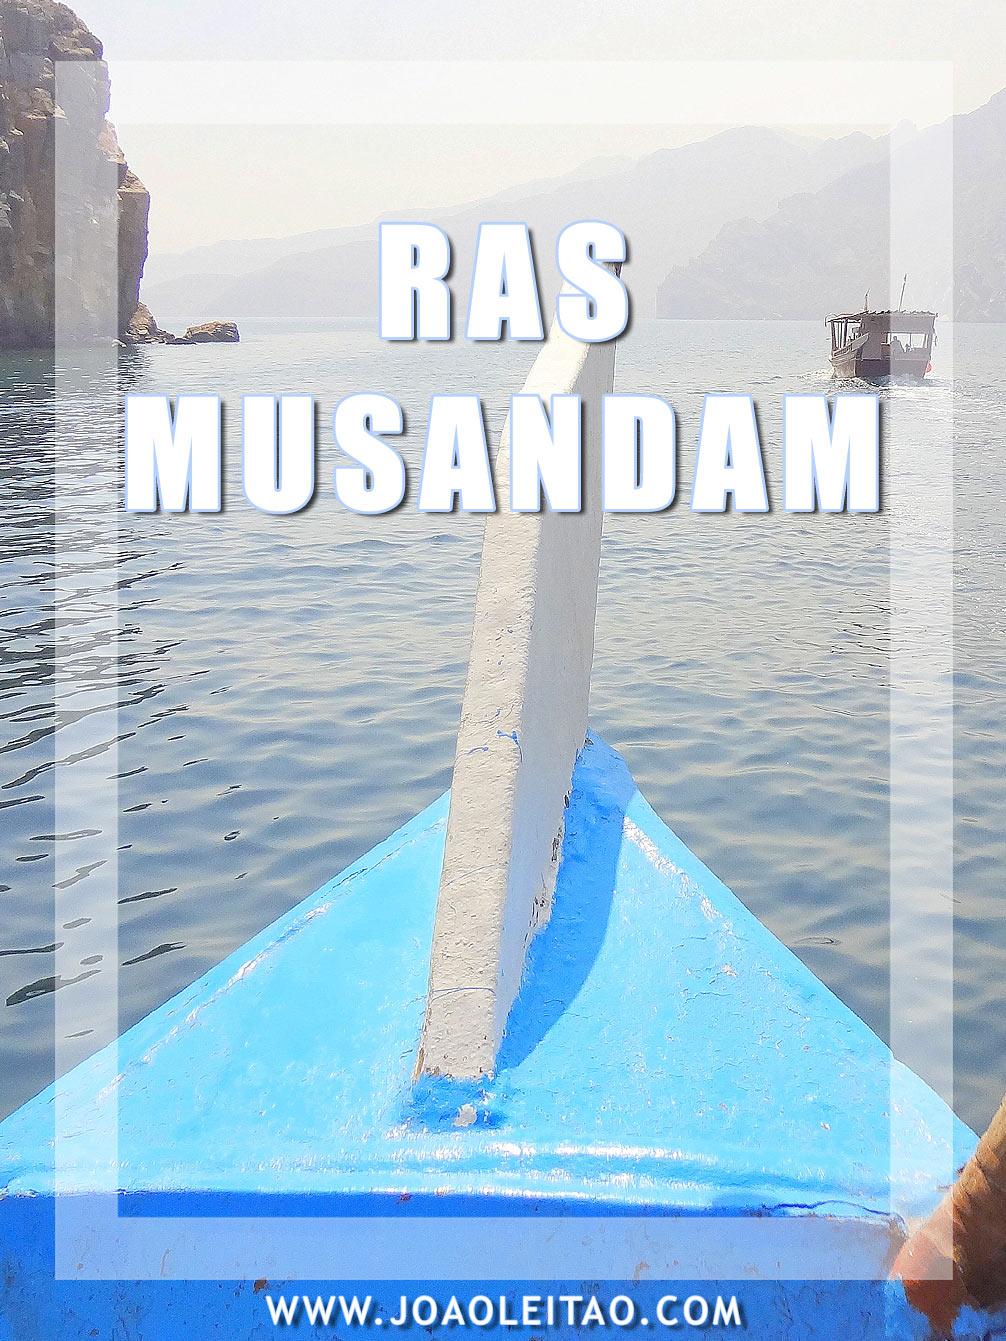 Visit Ras Musandam